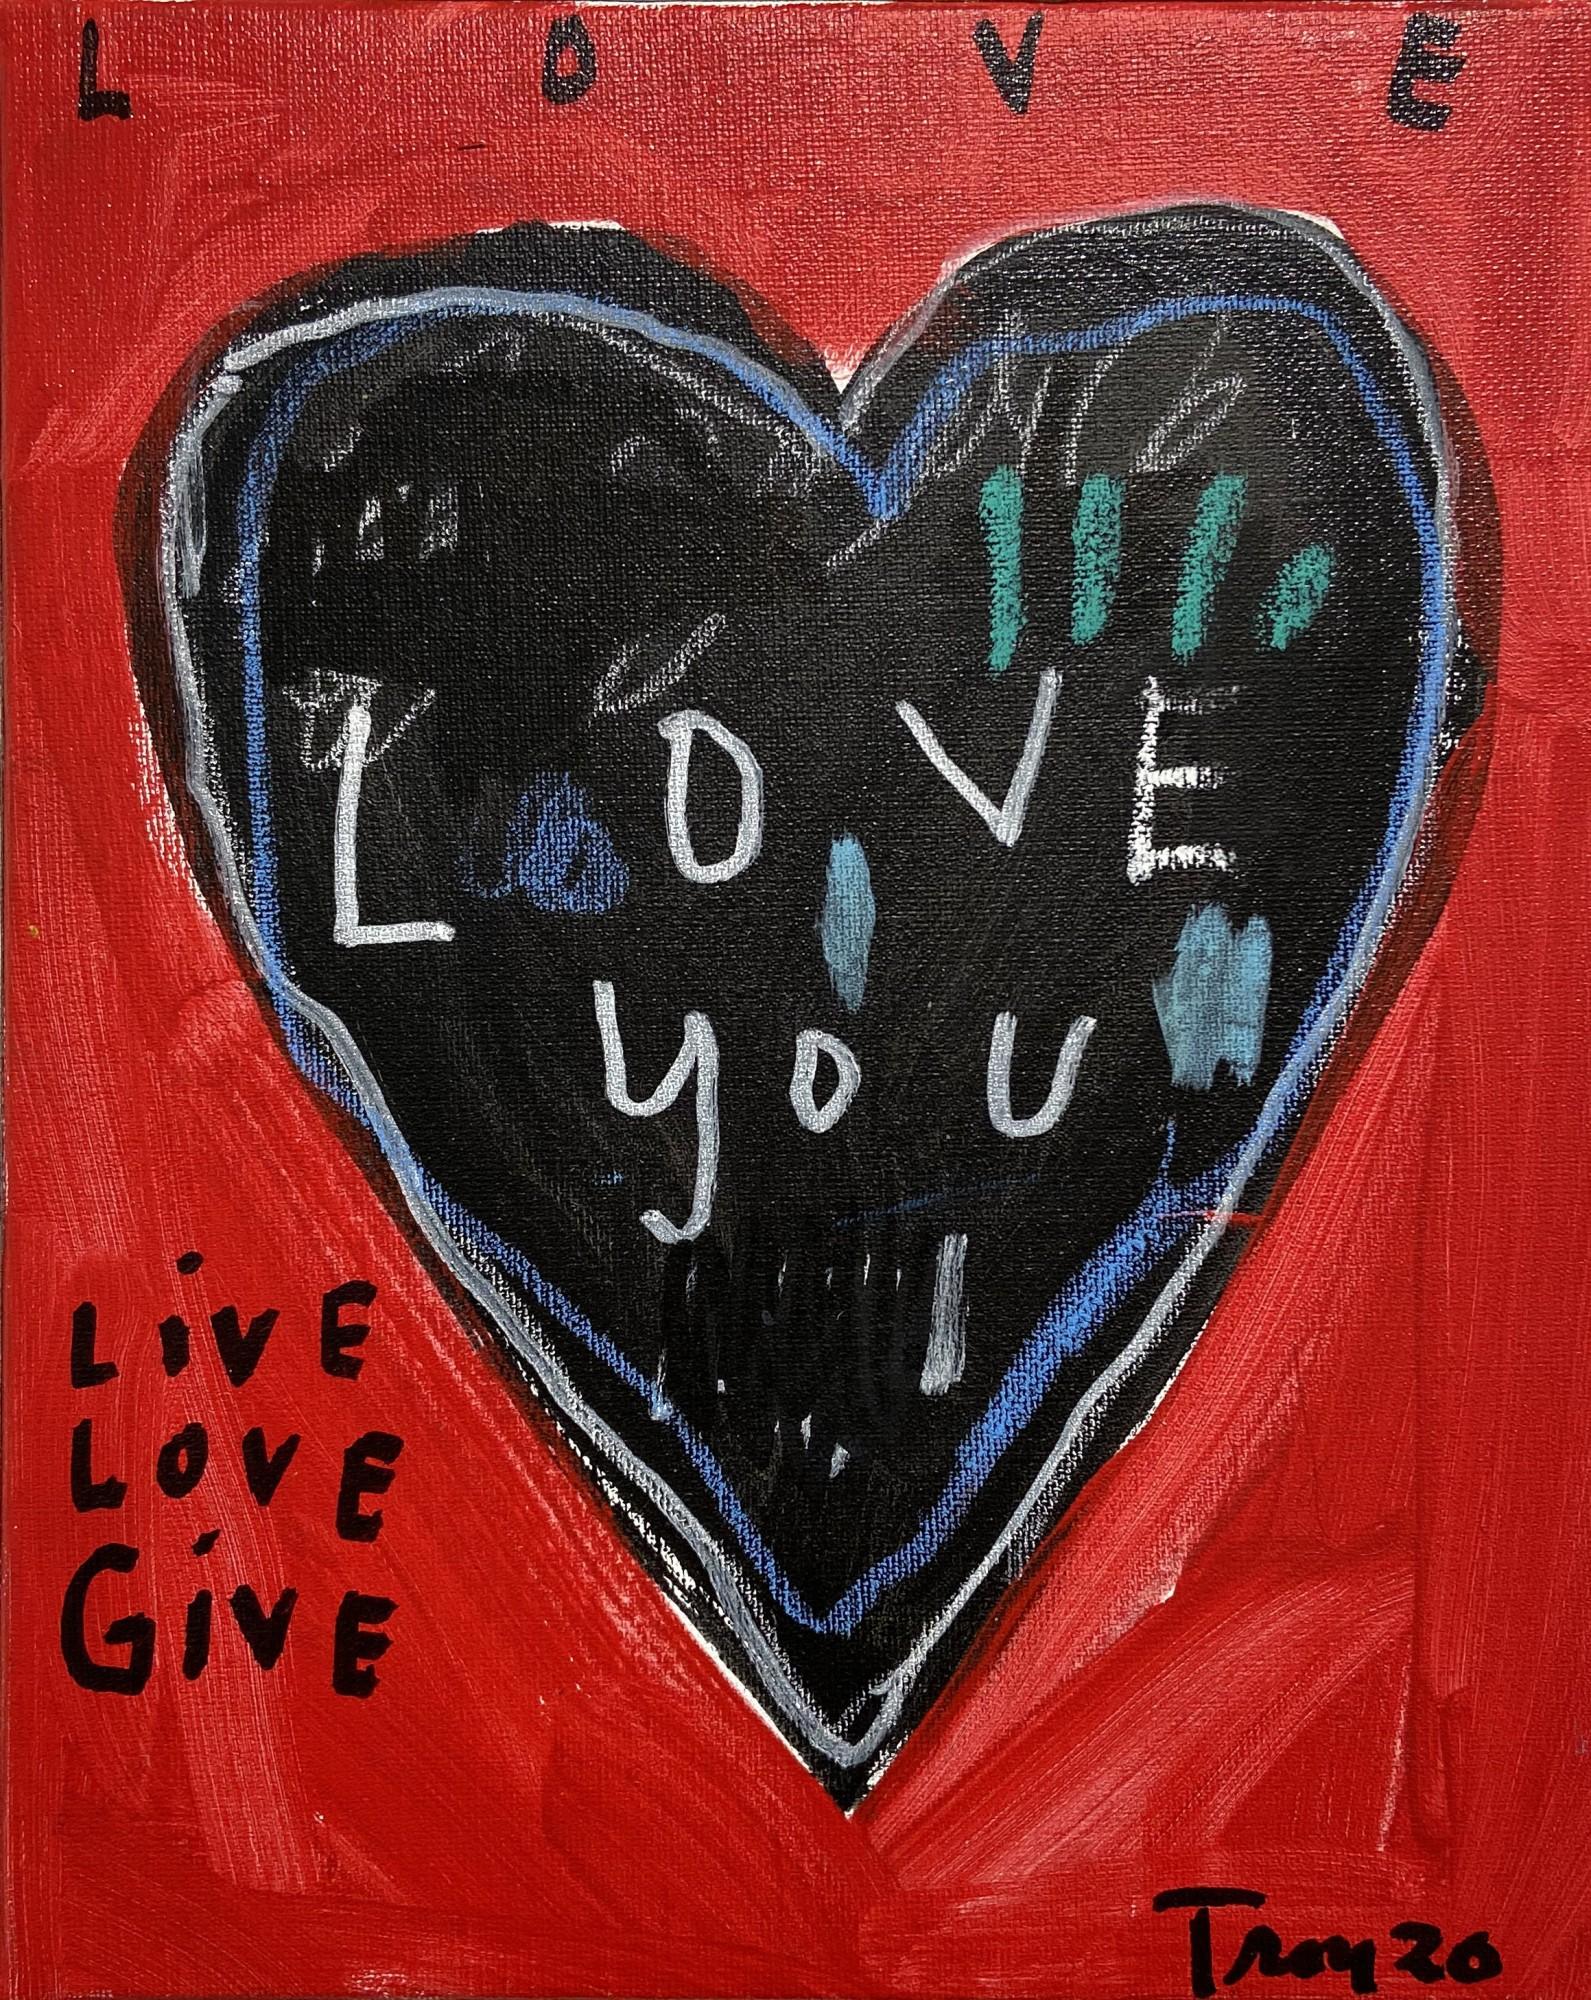 Troy Henriksen - Live love give